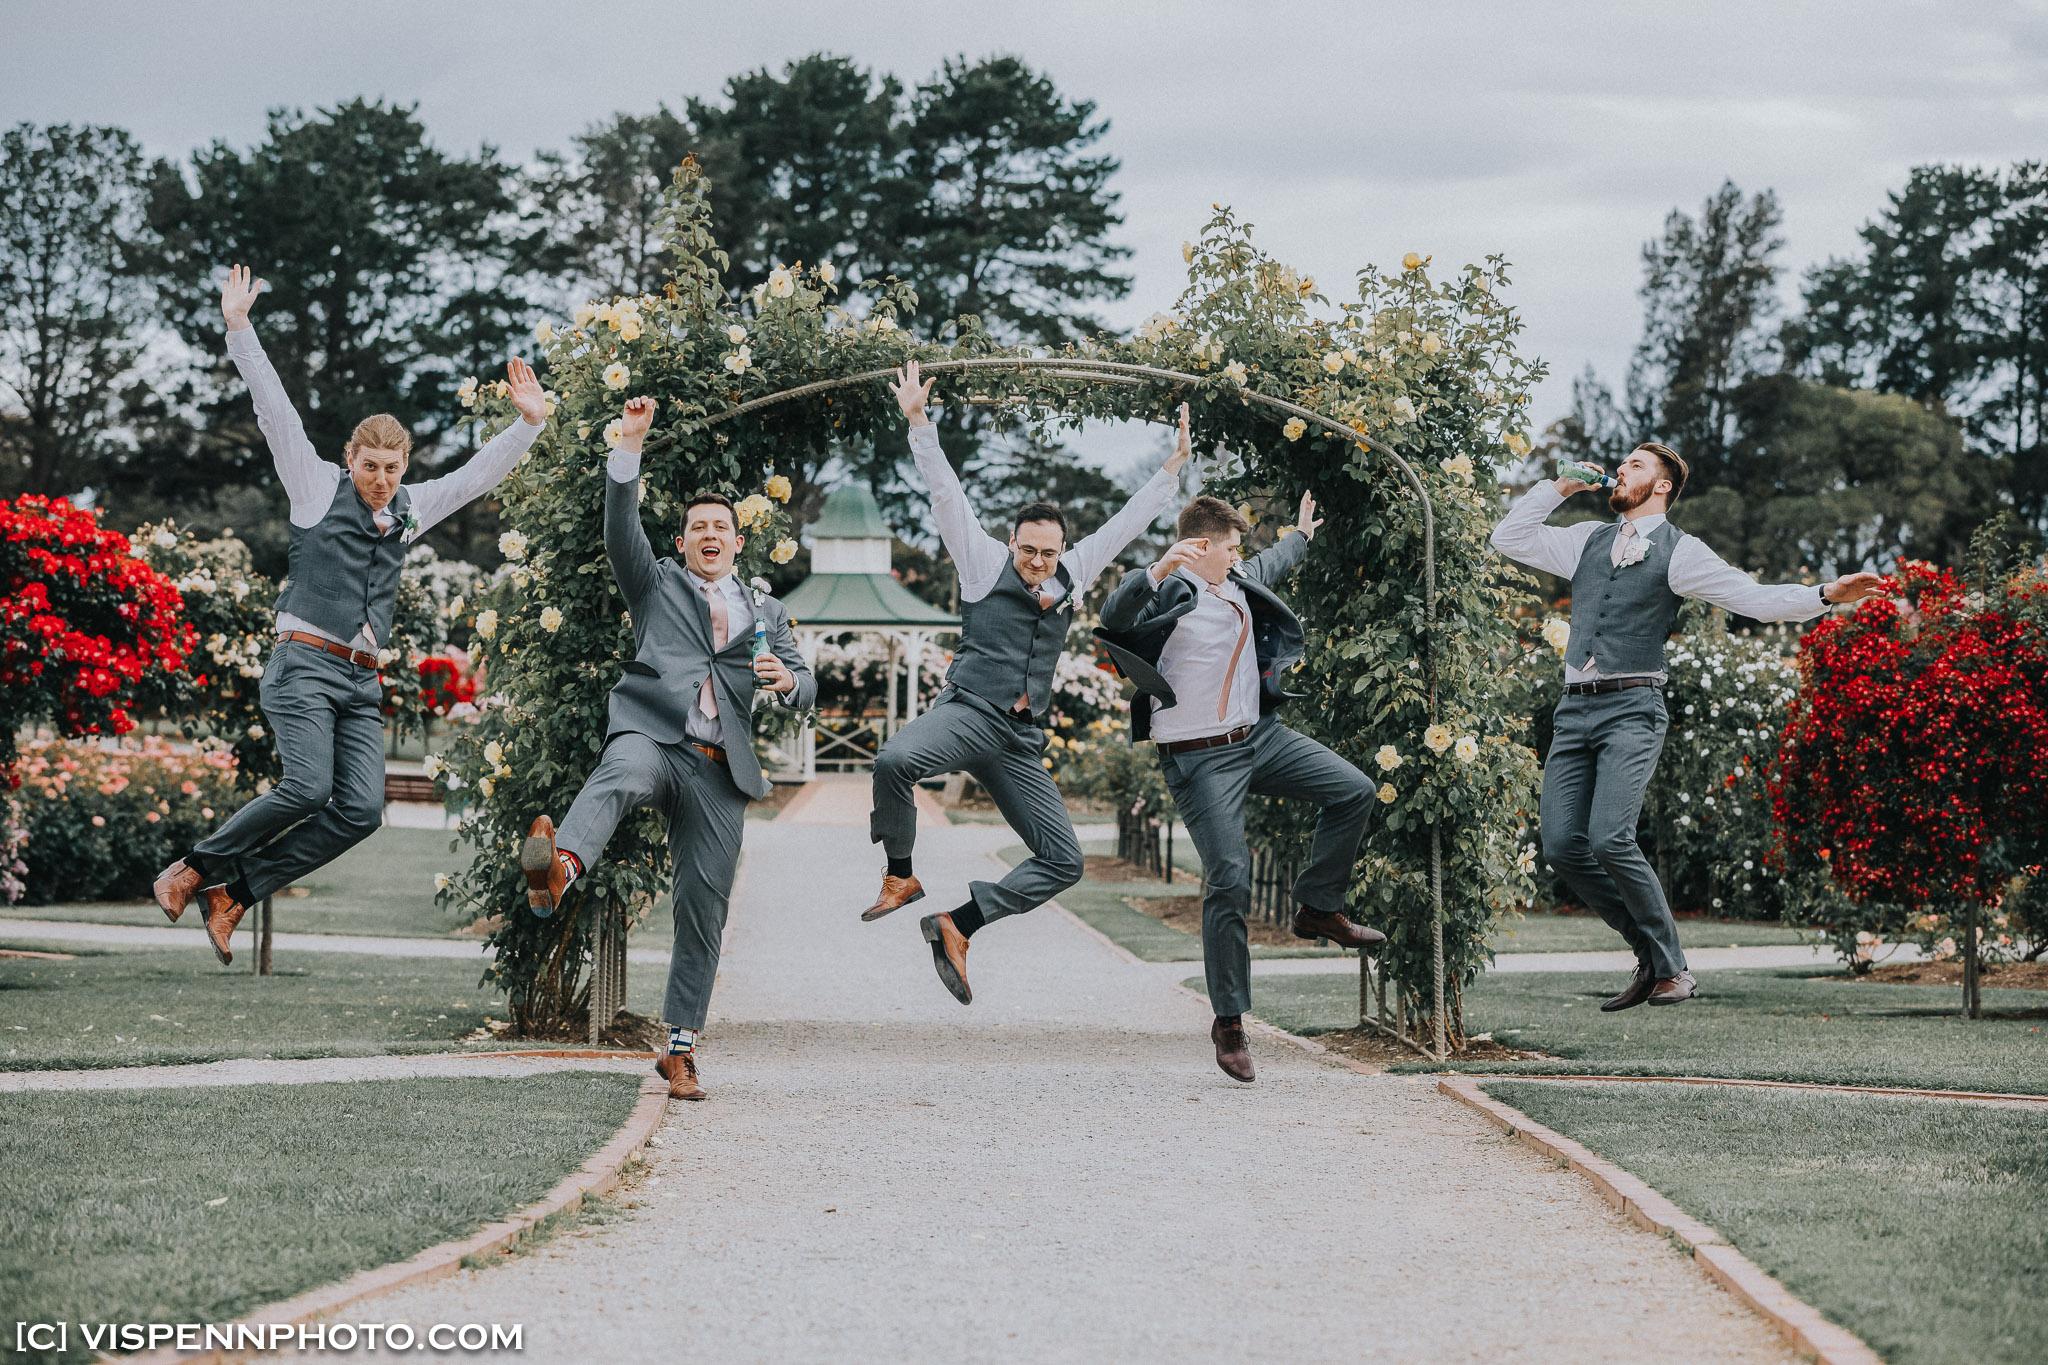 WEDDING DAY Photography Melbourne ZHPENN Kat P1 08285